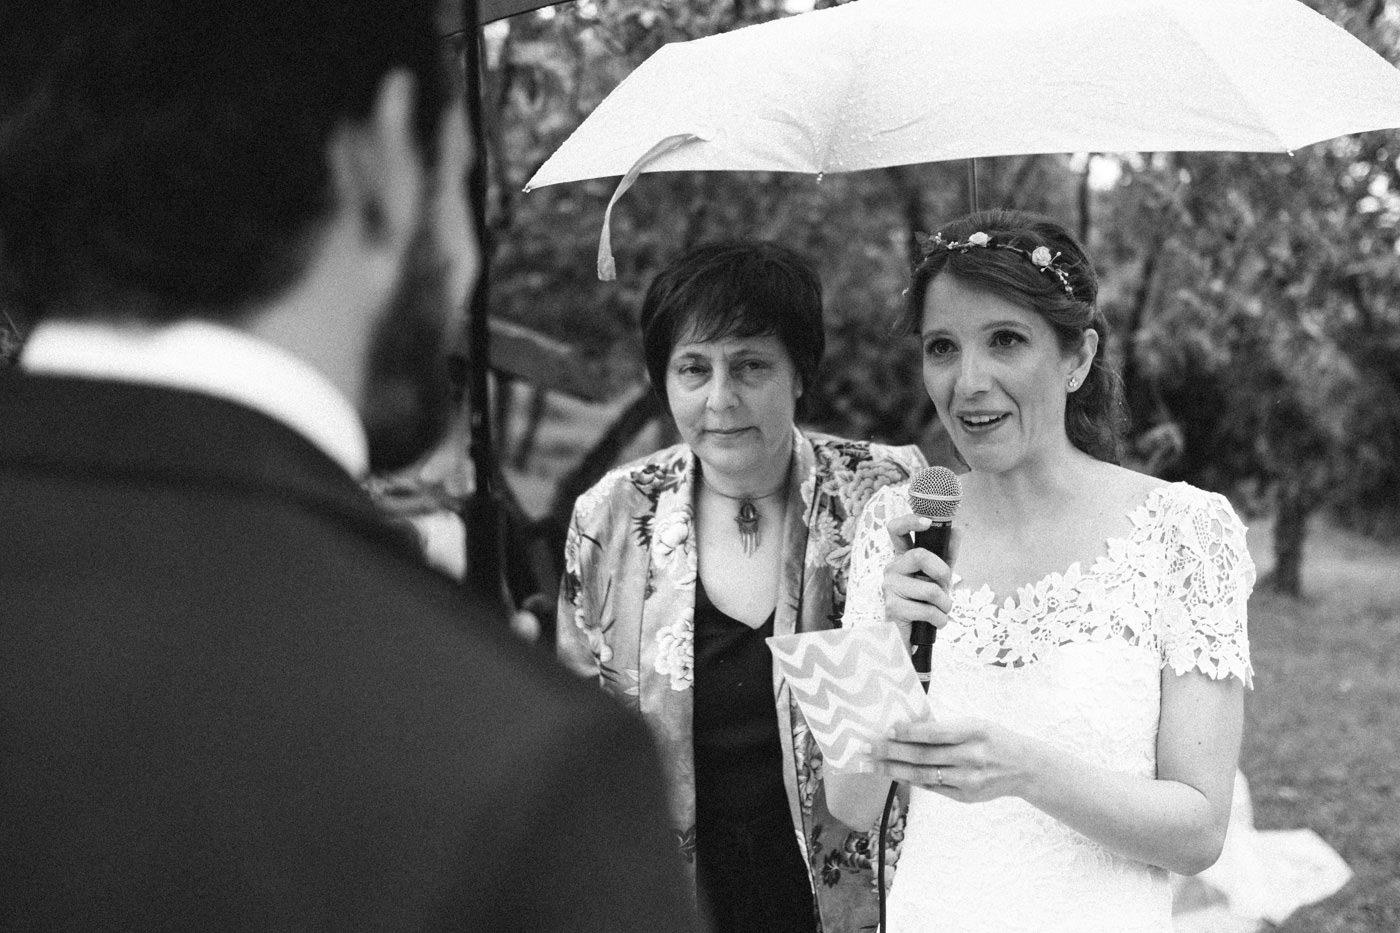 matrimoni_all_italiana_fotografo_matrimonio_toscana-41.jpg